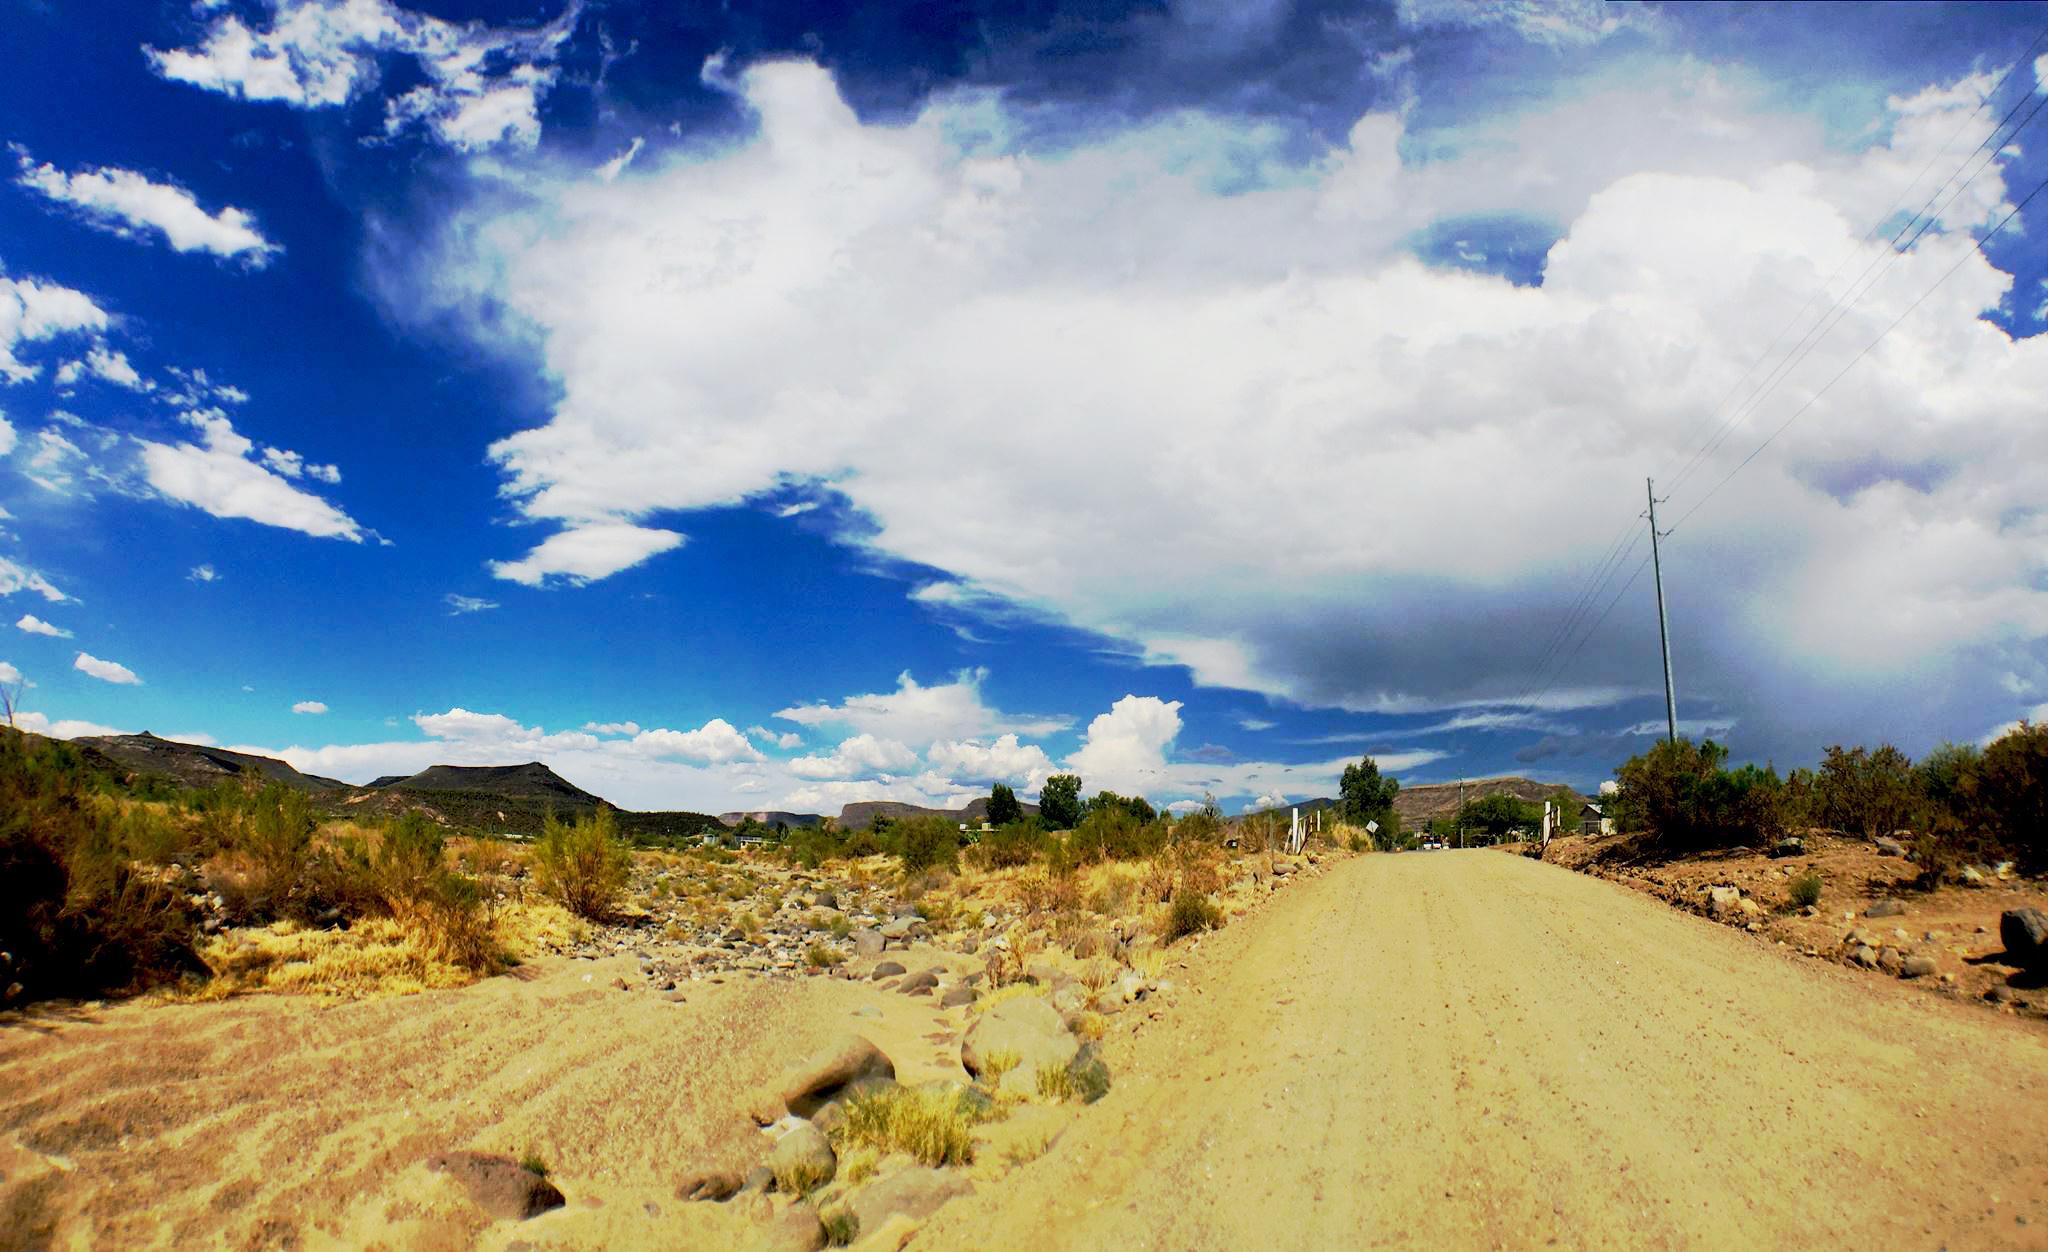 111110  arizona dust with lauyers contrast